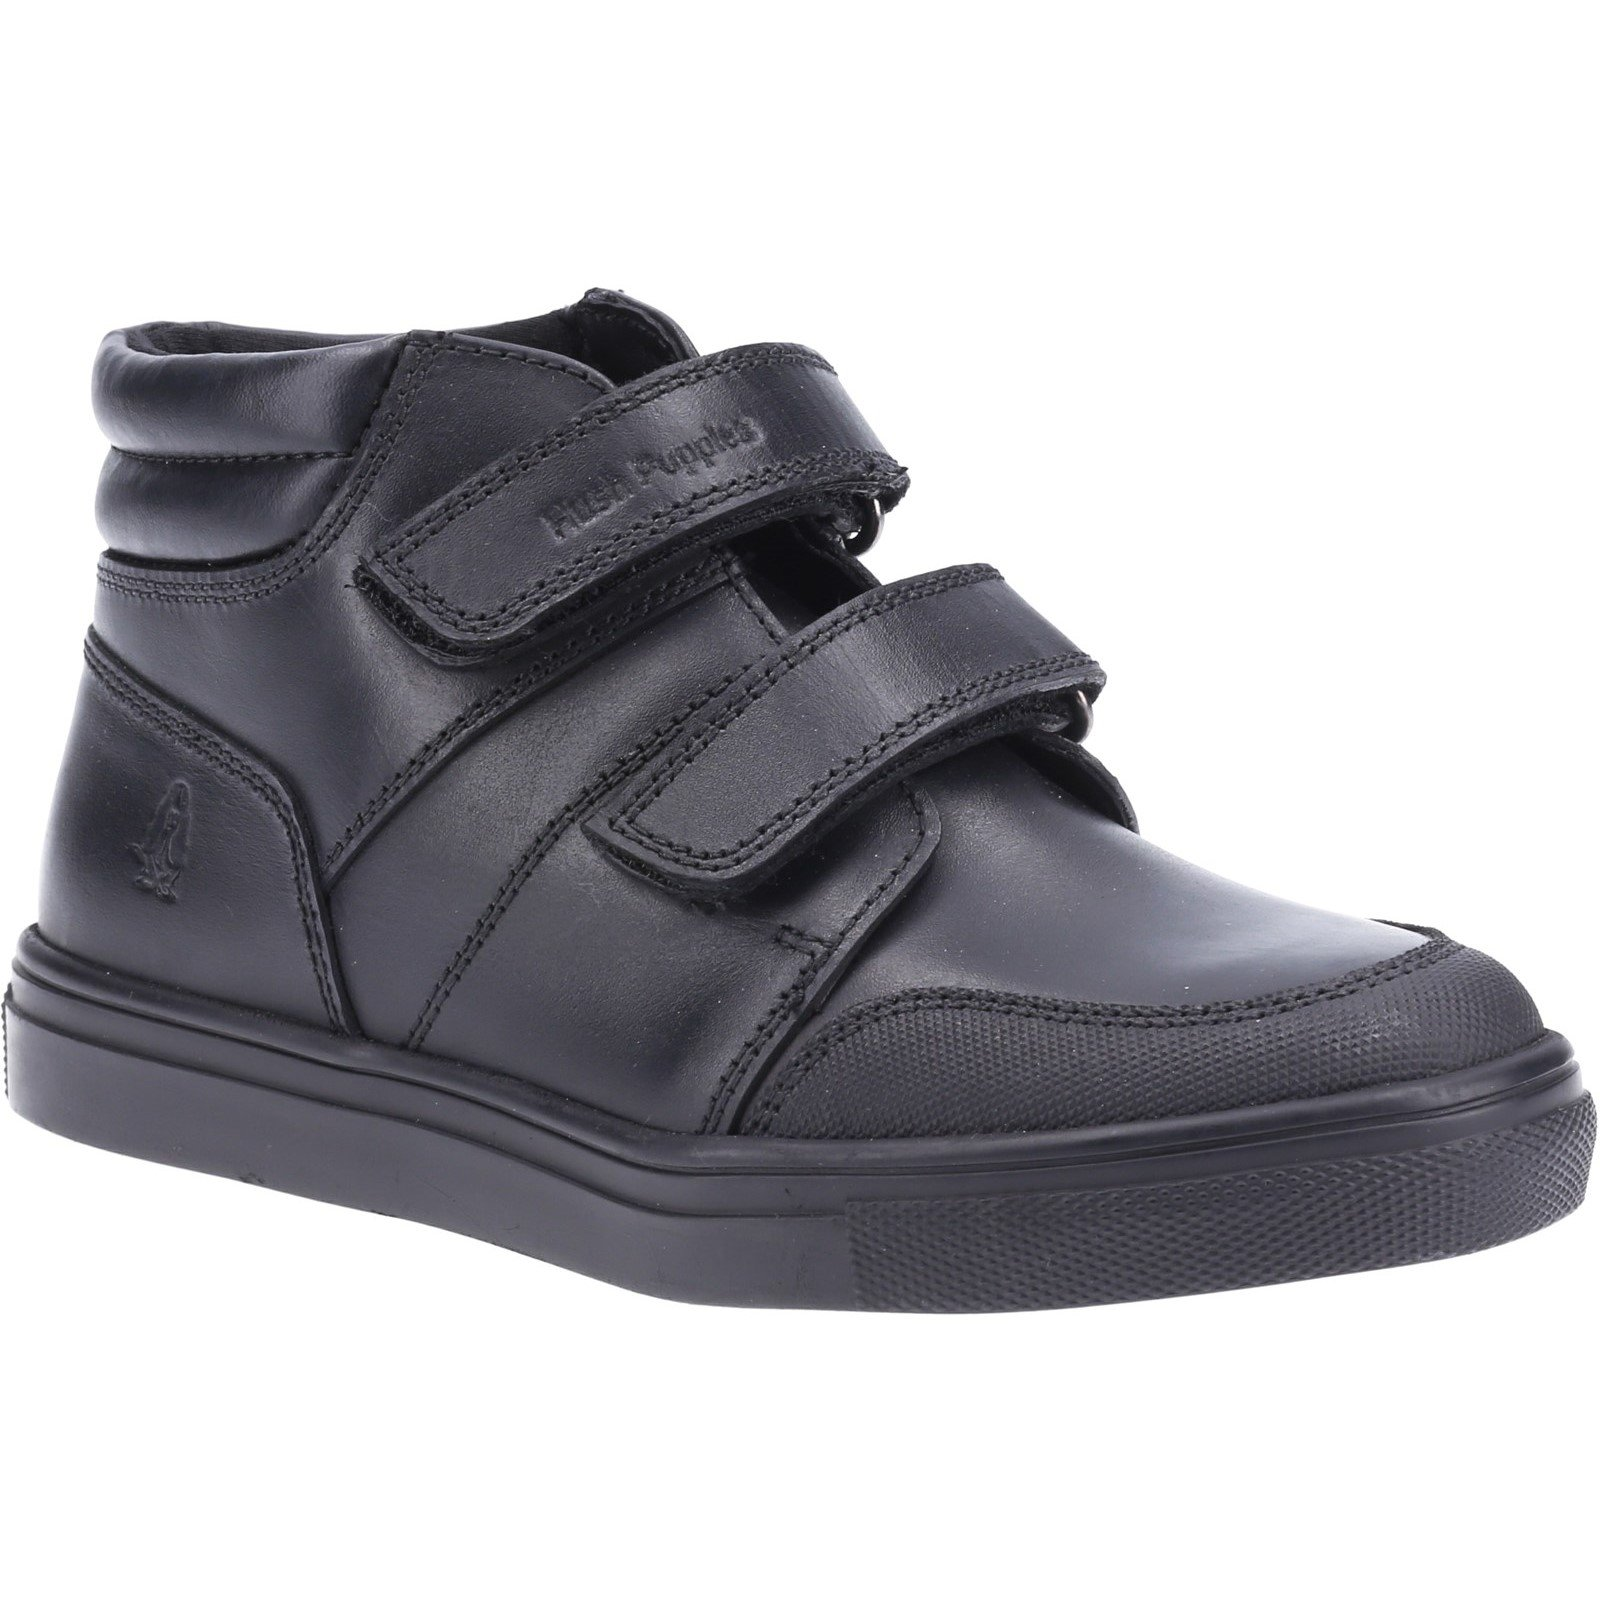 Hush Puppies Kid's Seth Junior Boot Black 32570 - Black 1